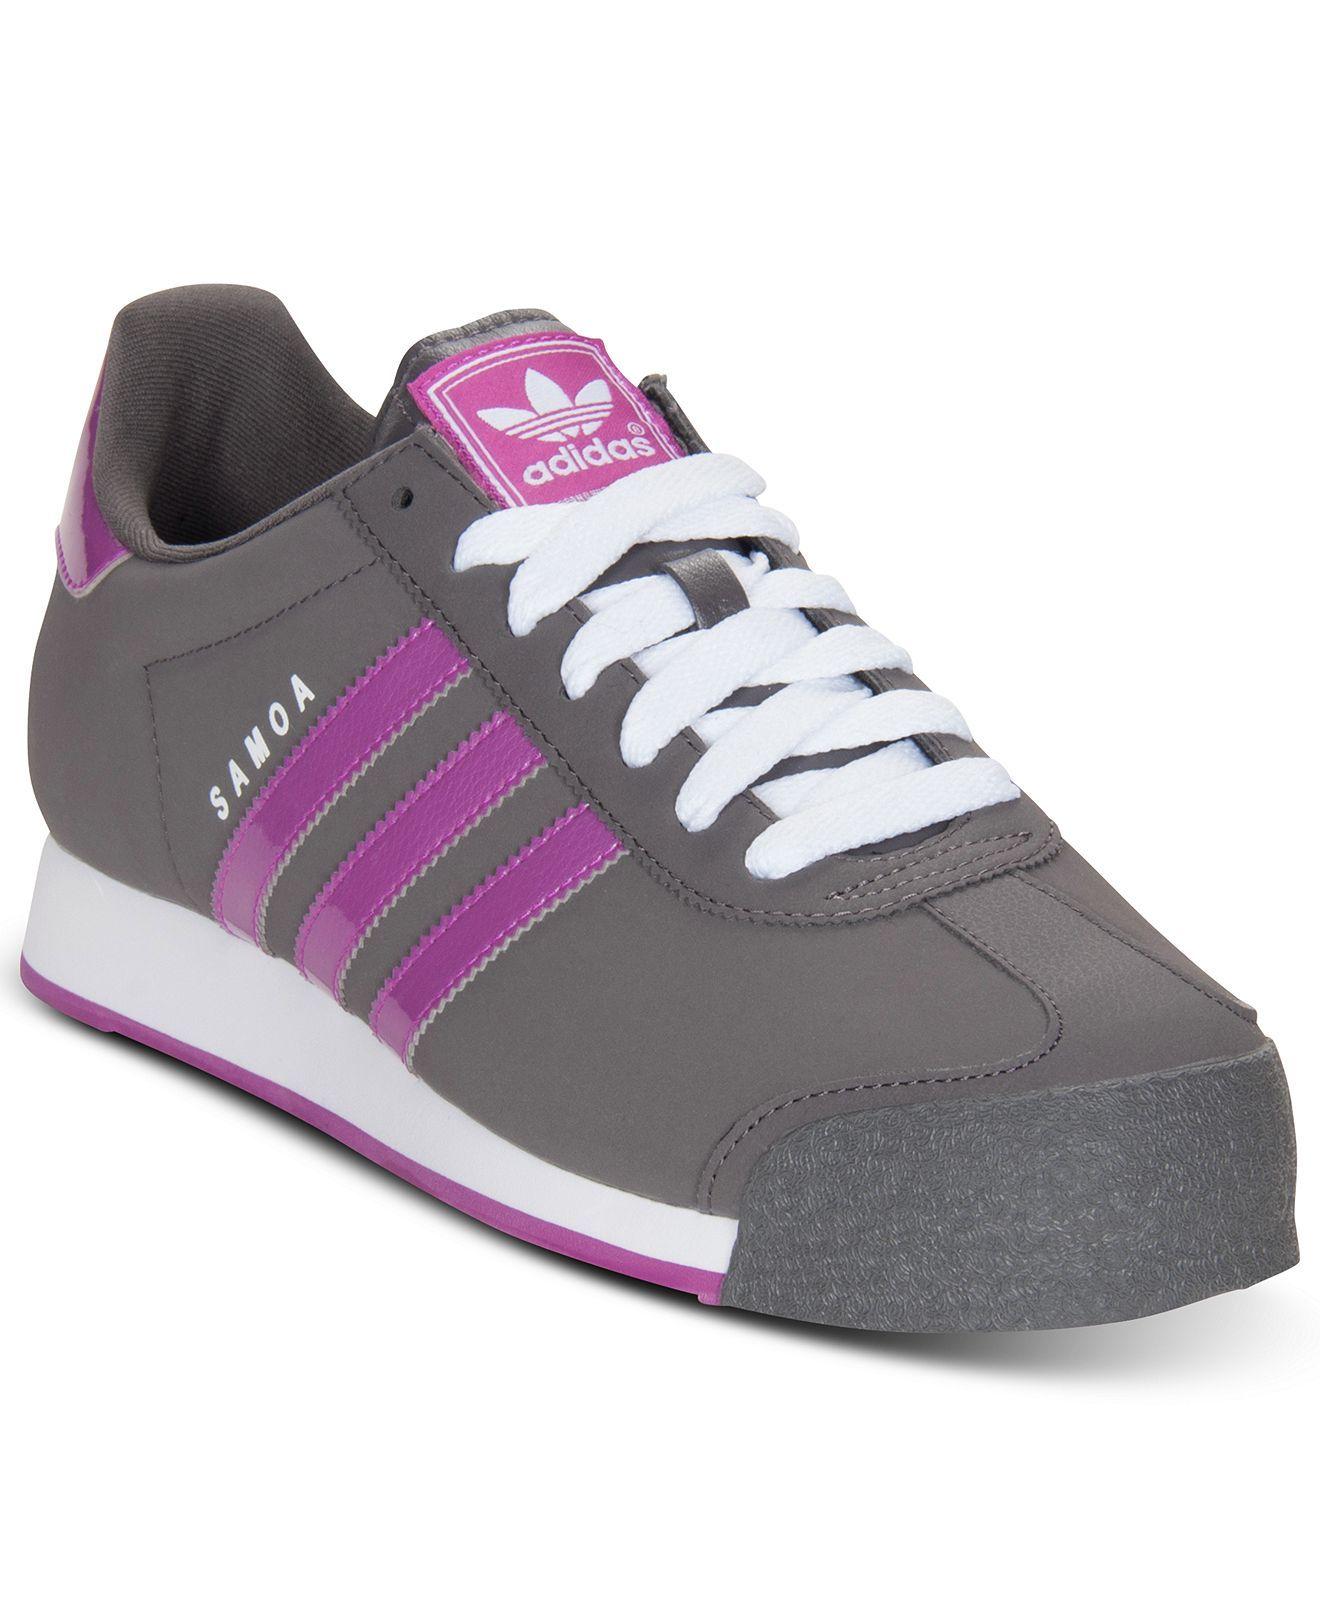 adidas Women's Samoa Sneakers from Finish Line Kids